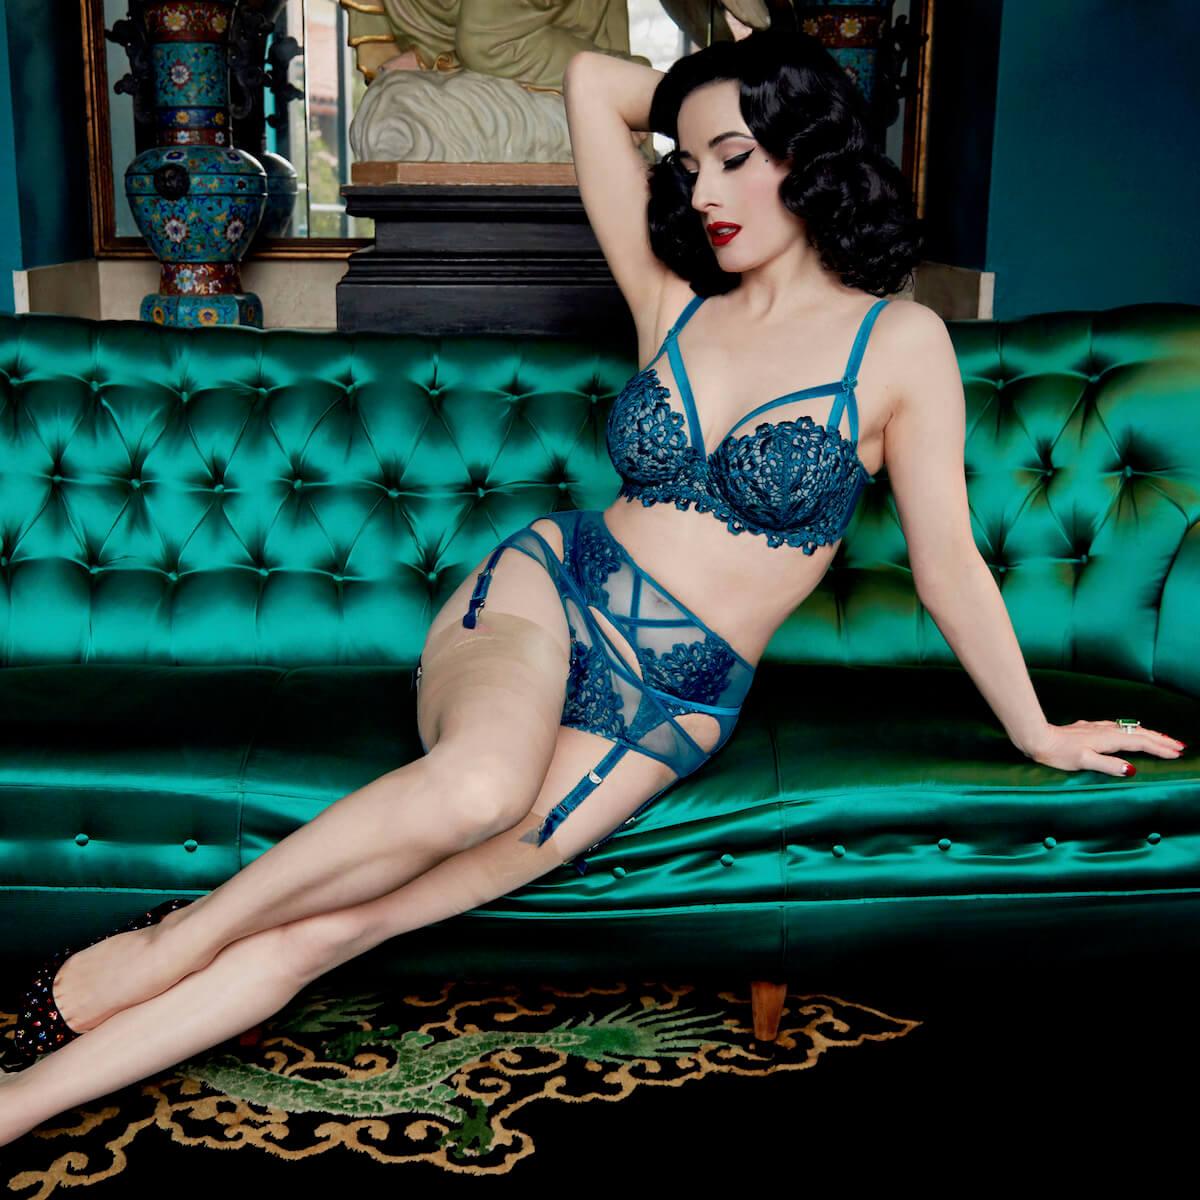 ff52bce6a46 Lavish lingerie from Dita Von Teese - Melissa Hoyer